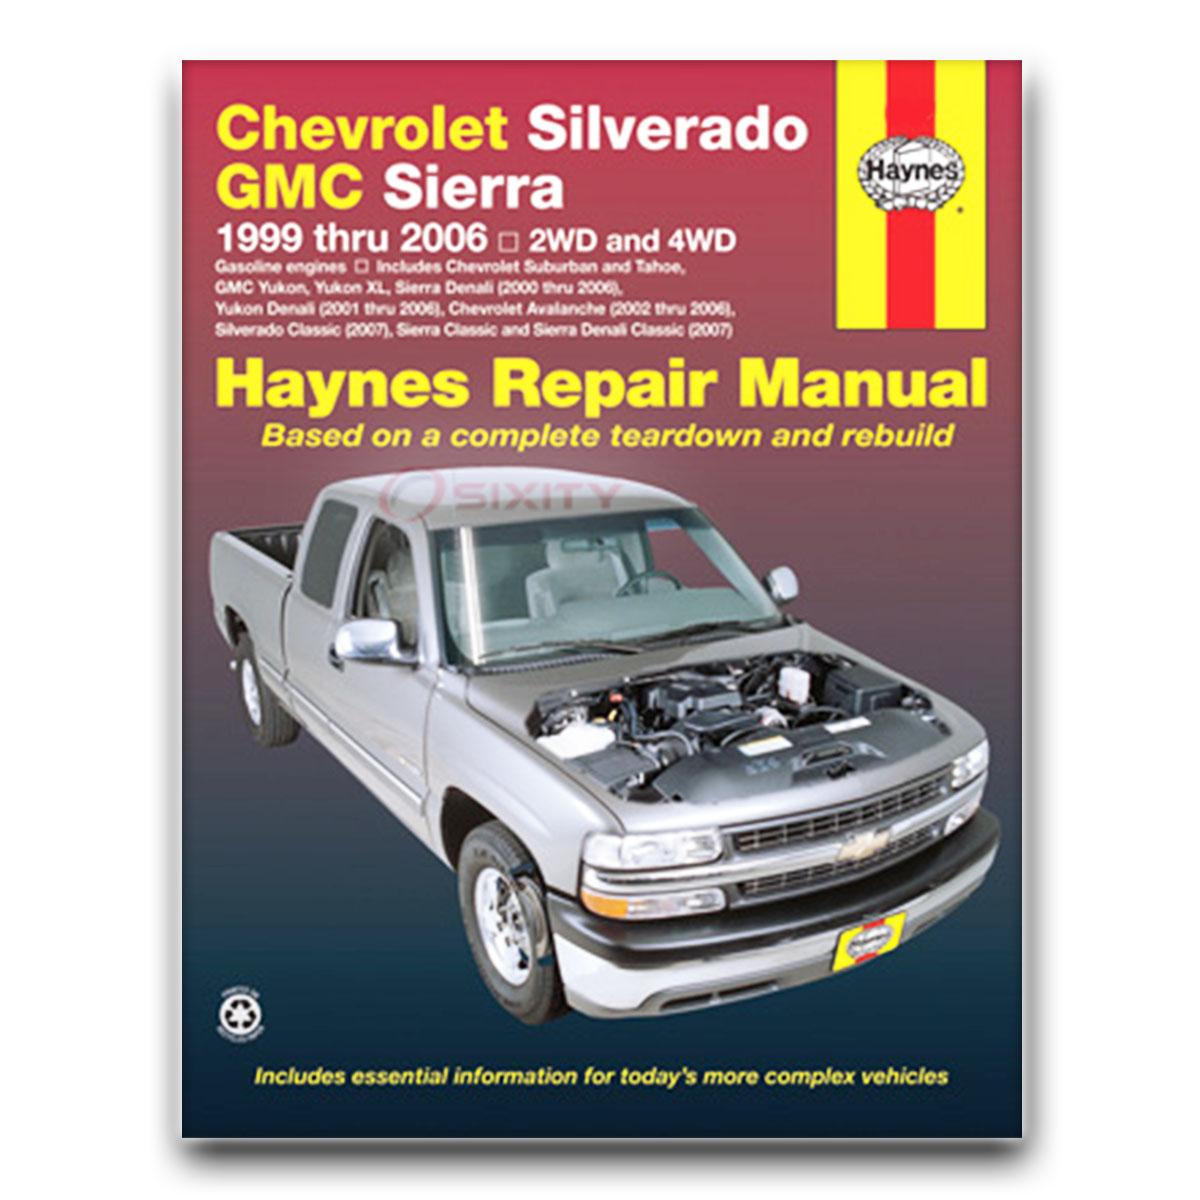 Haynes Repair Manual for Chevy Silverado 1500 LT Classic Base Z71 WT LS SS  it